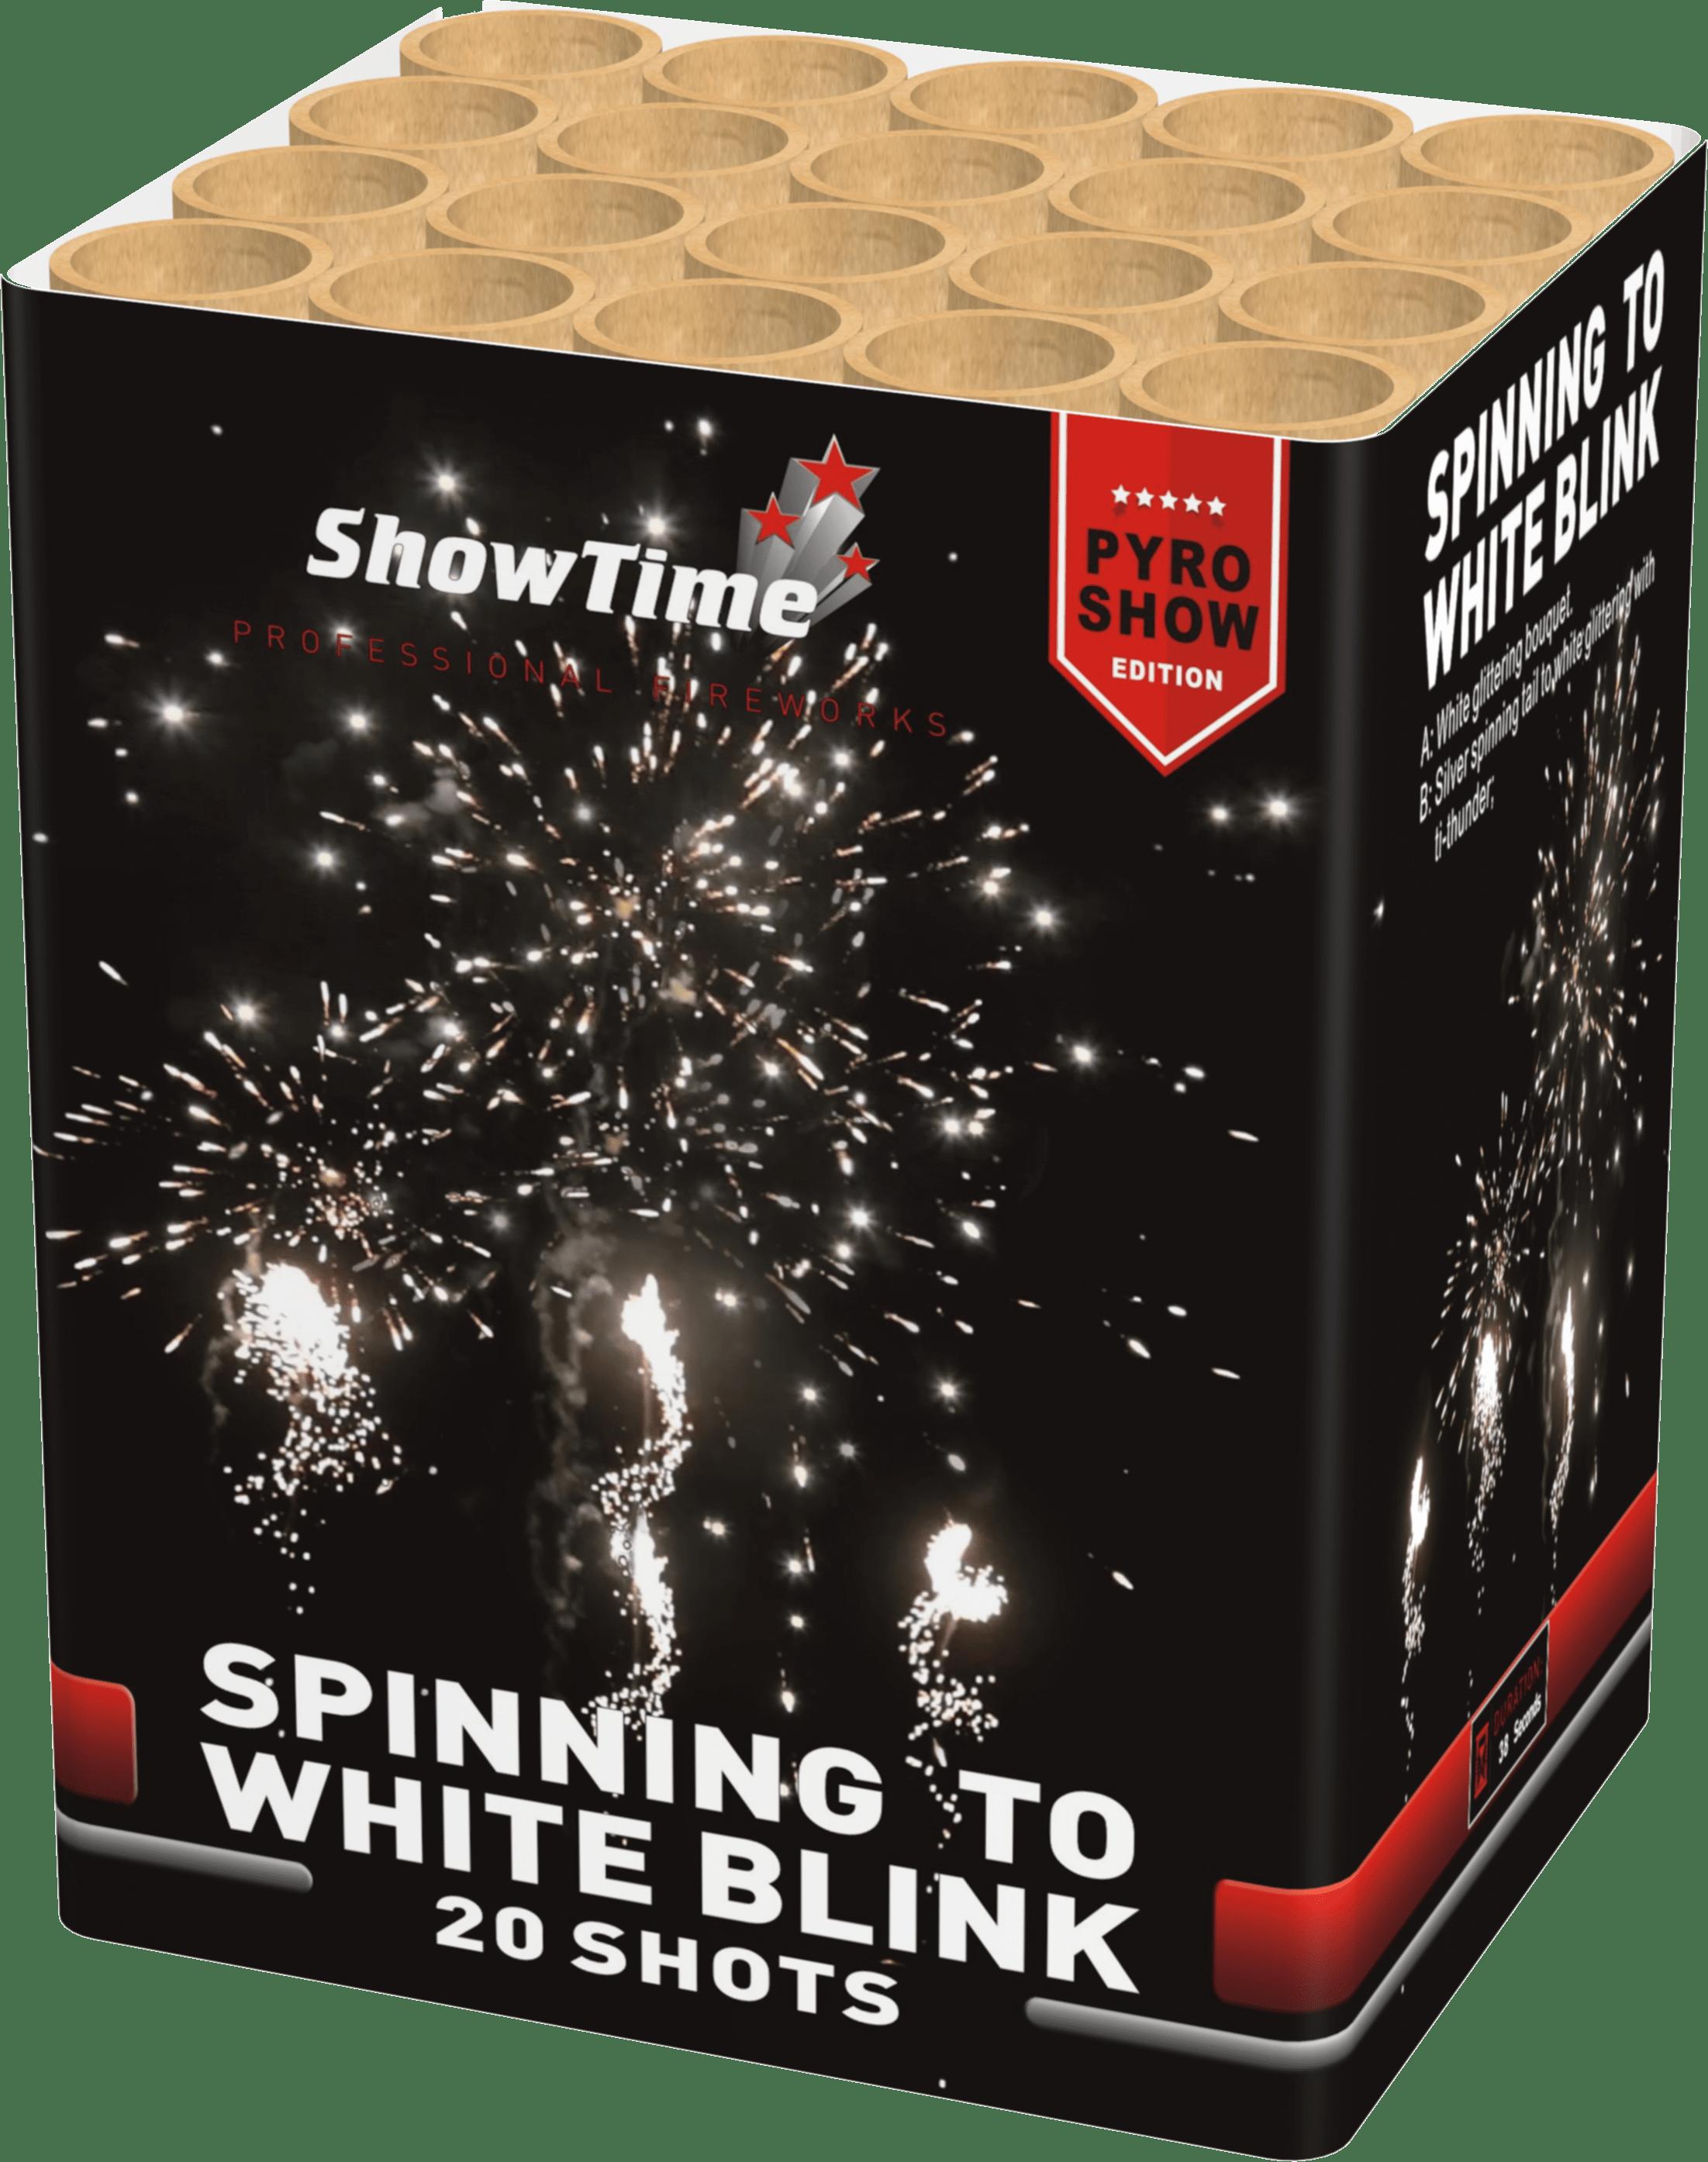 Spinning to white blink